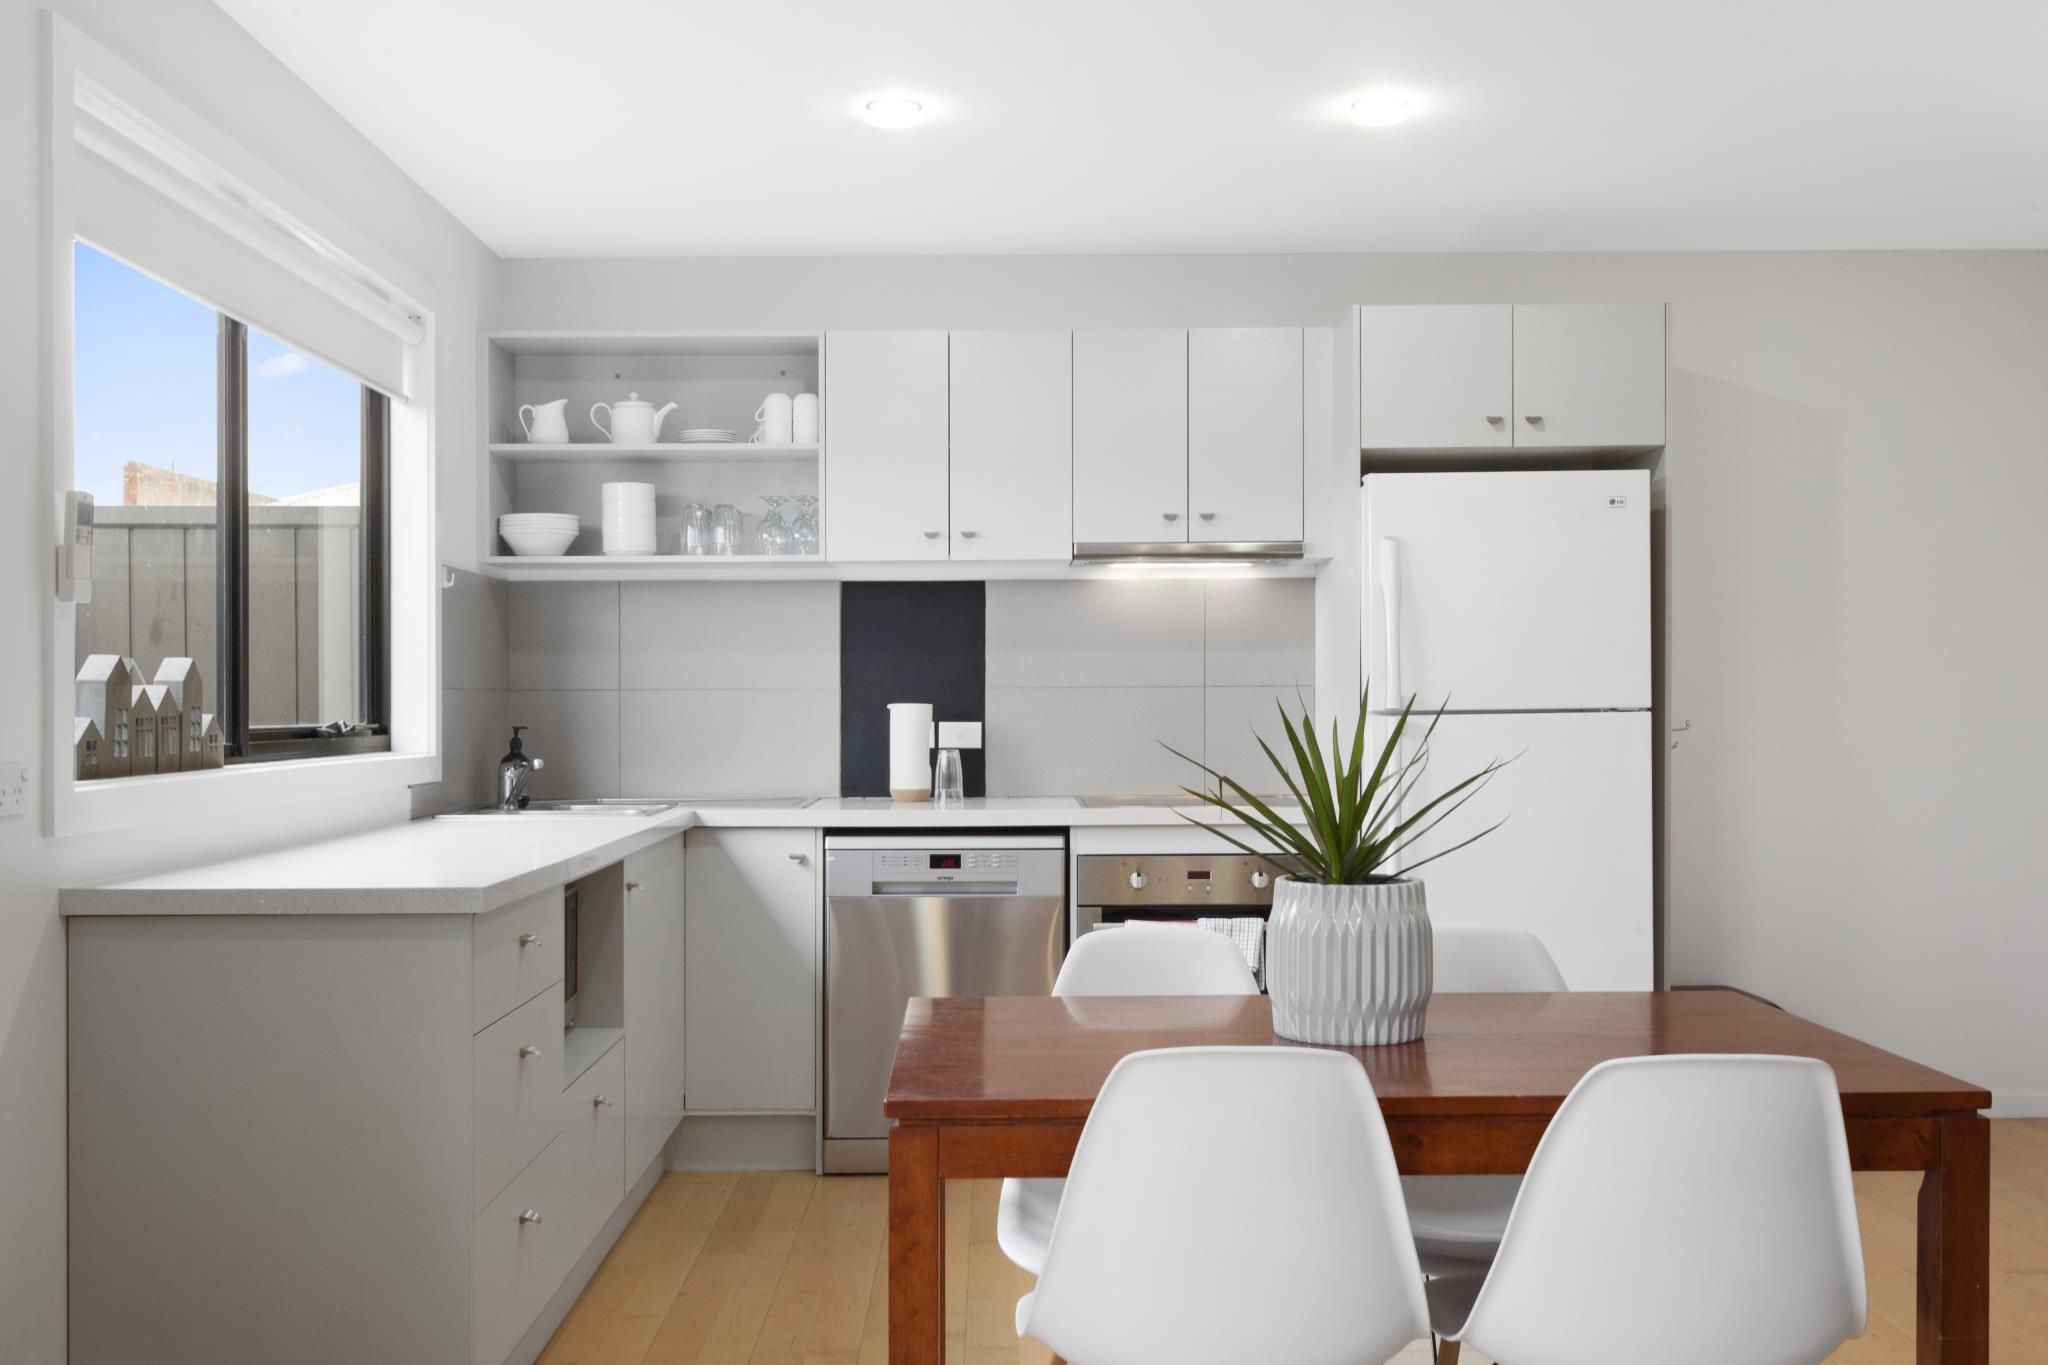 Manallack Apartments Boyd & Whiteley, Moreland - Brunswick